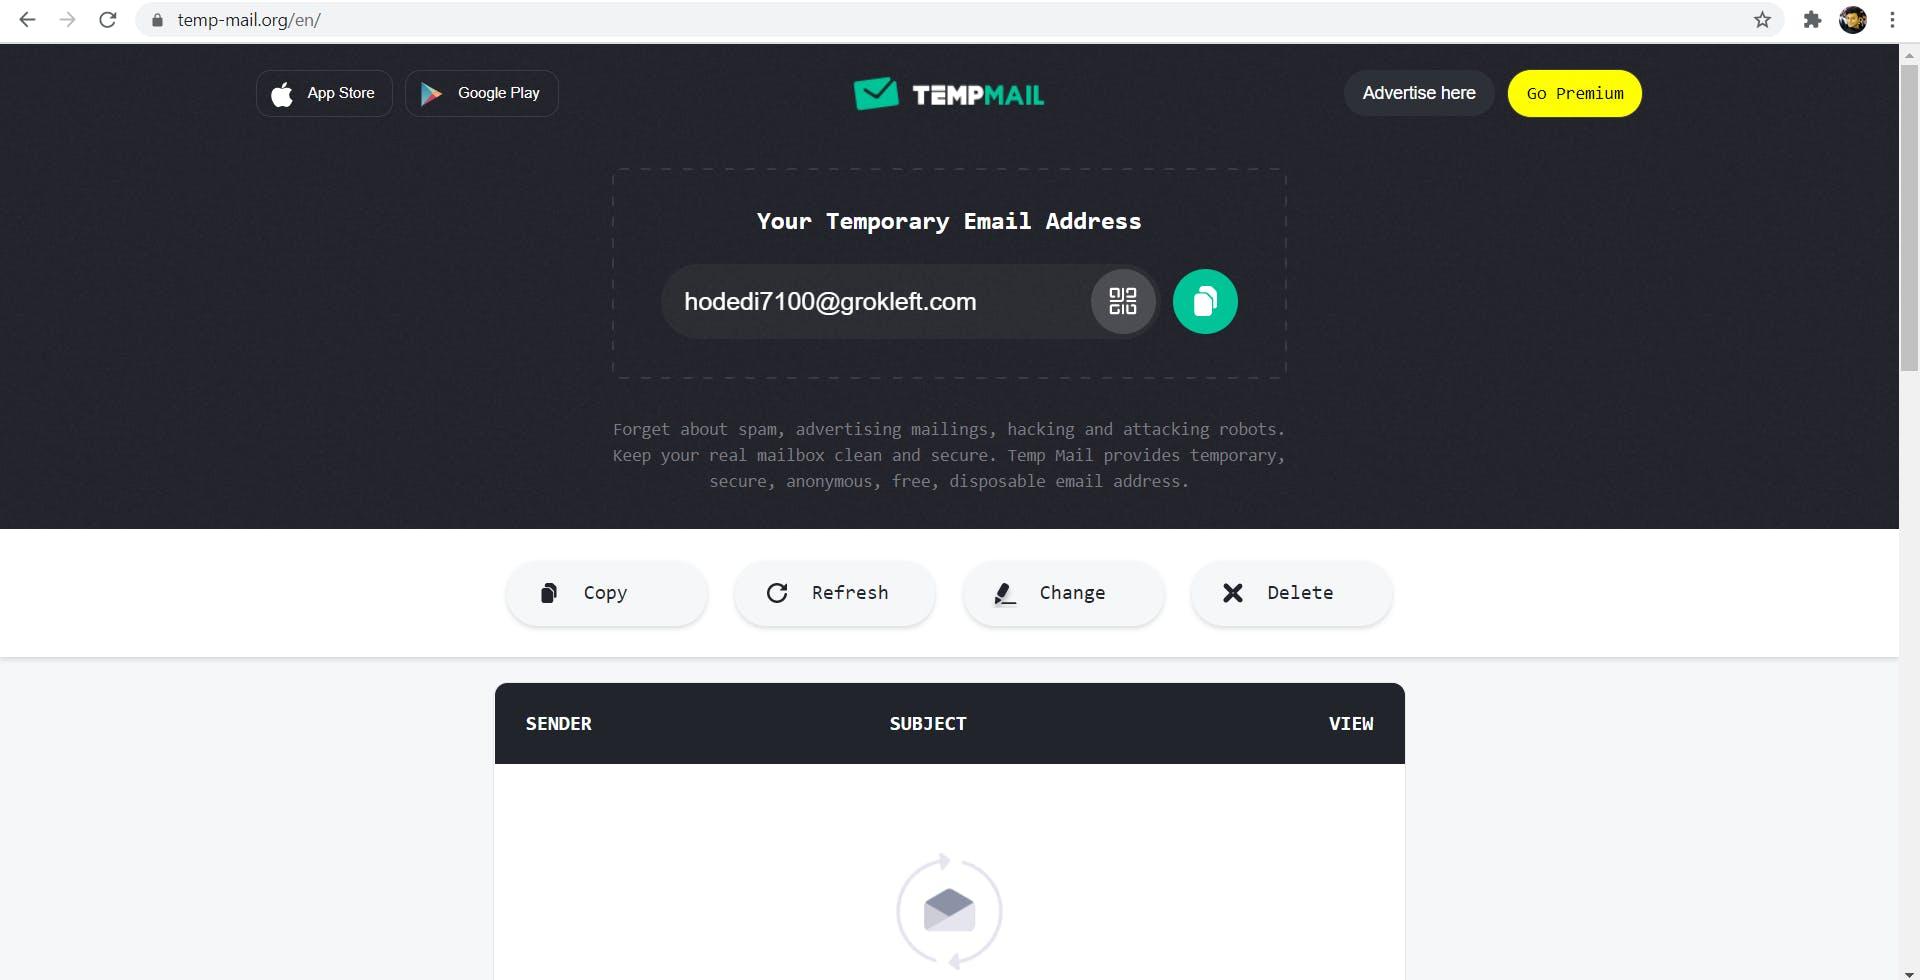 Temp-mail